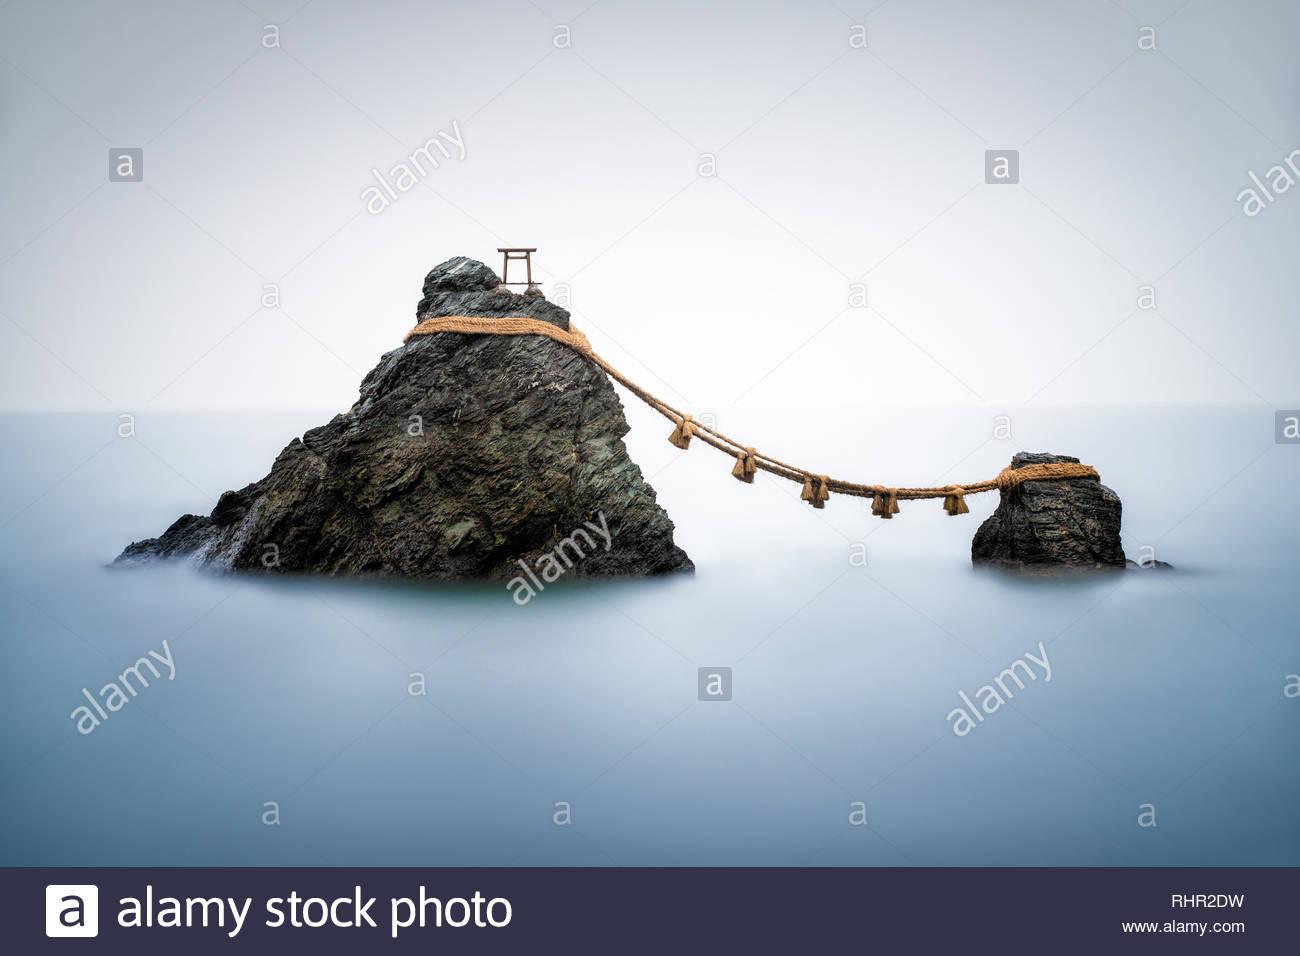 Sacred Meoto Iwa Rocks, Futami, Mie Prefecture, Japan - Stock Image